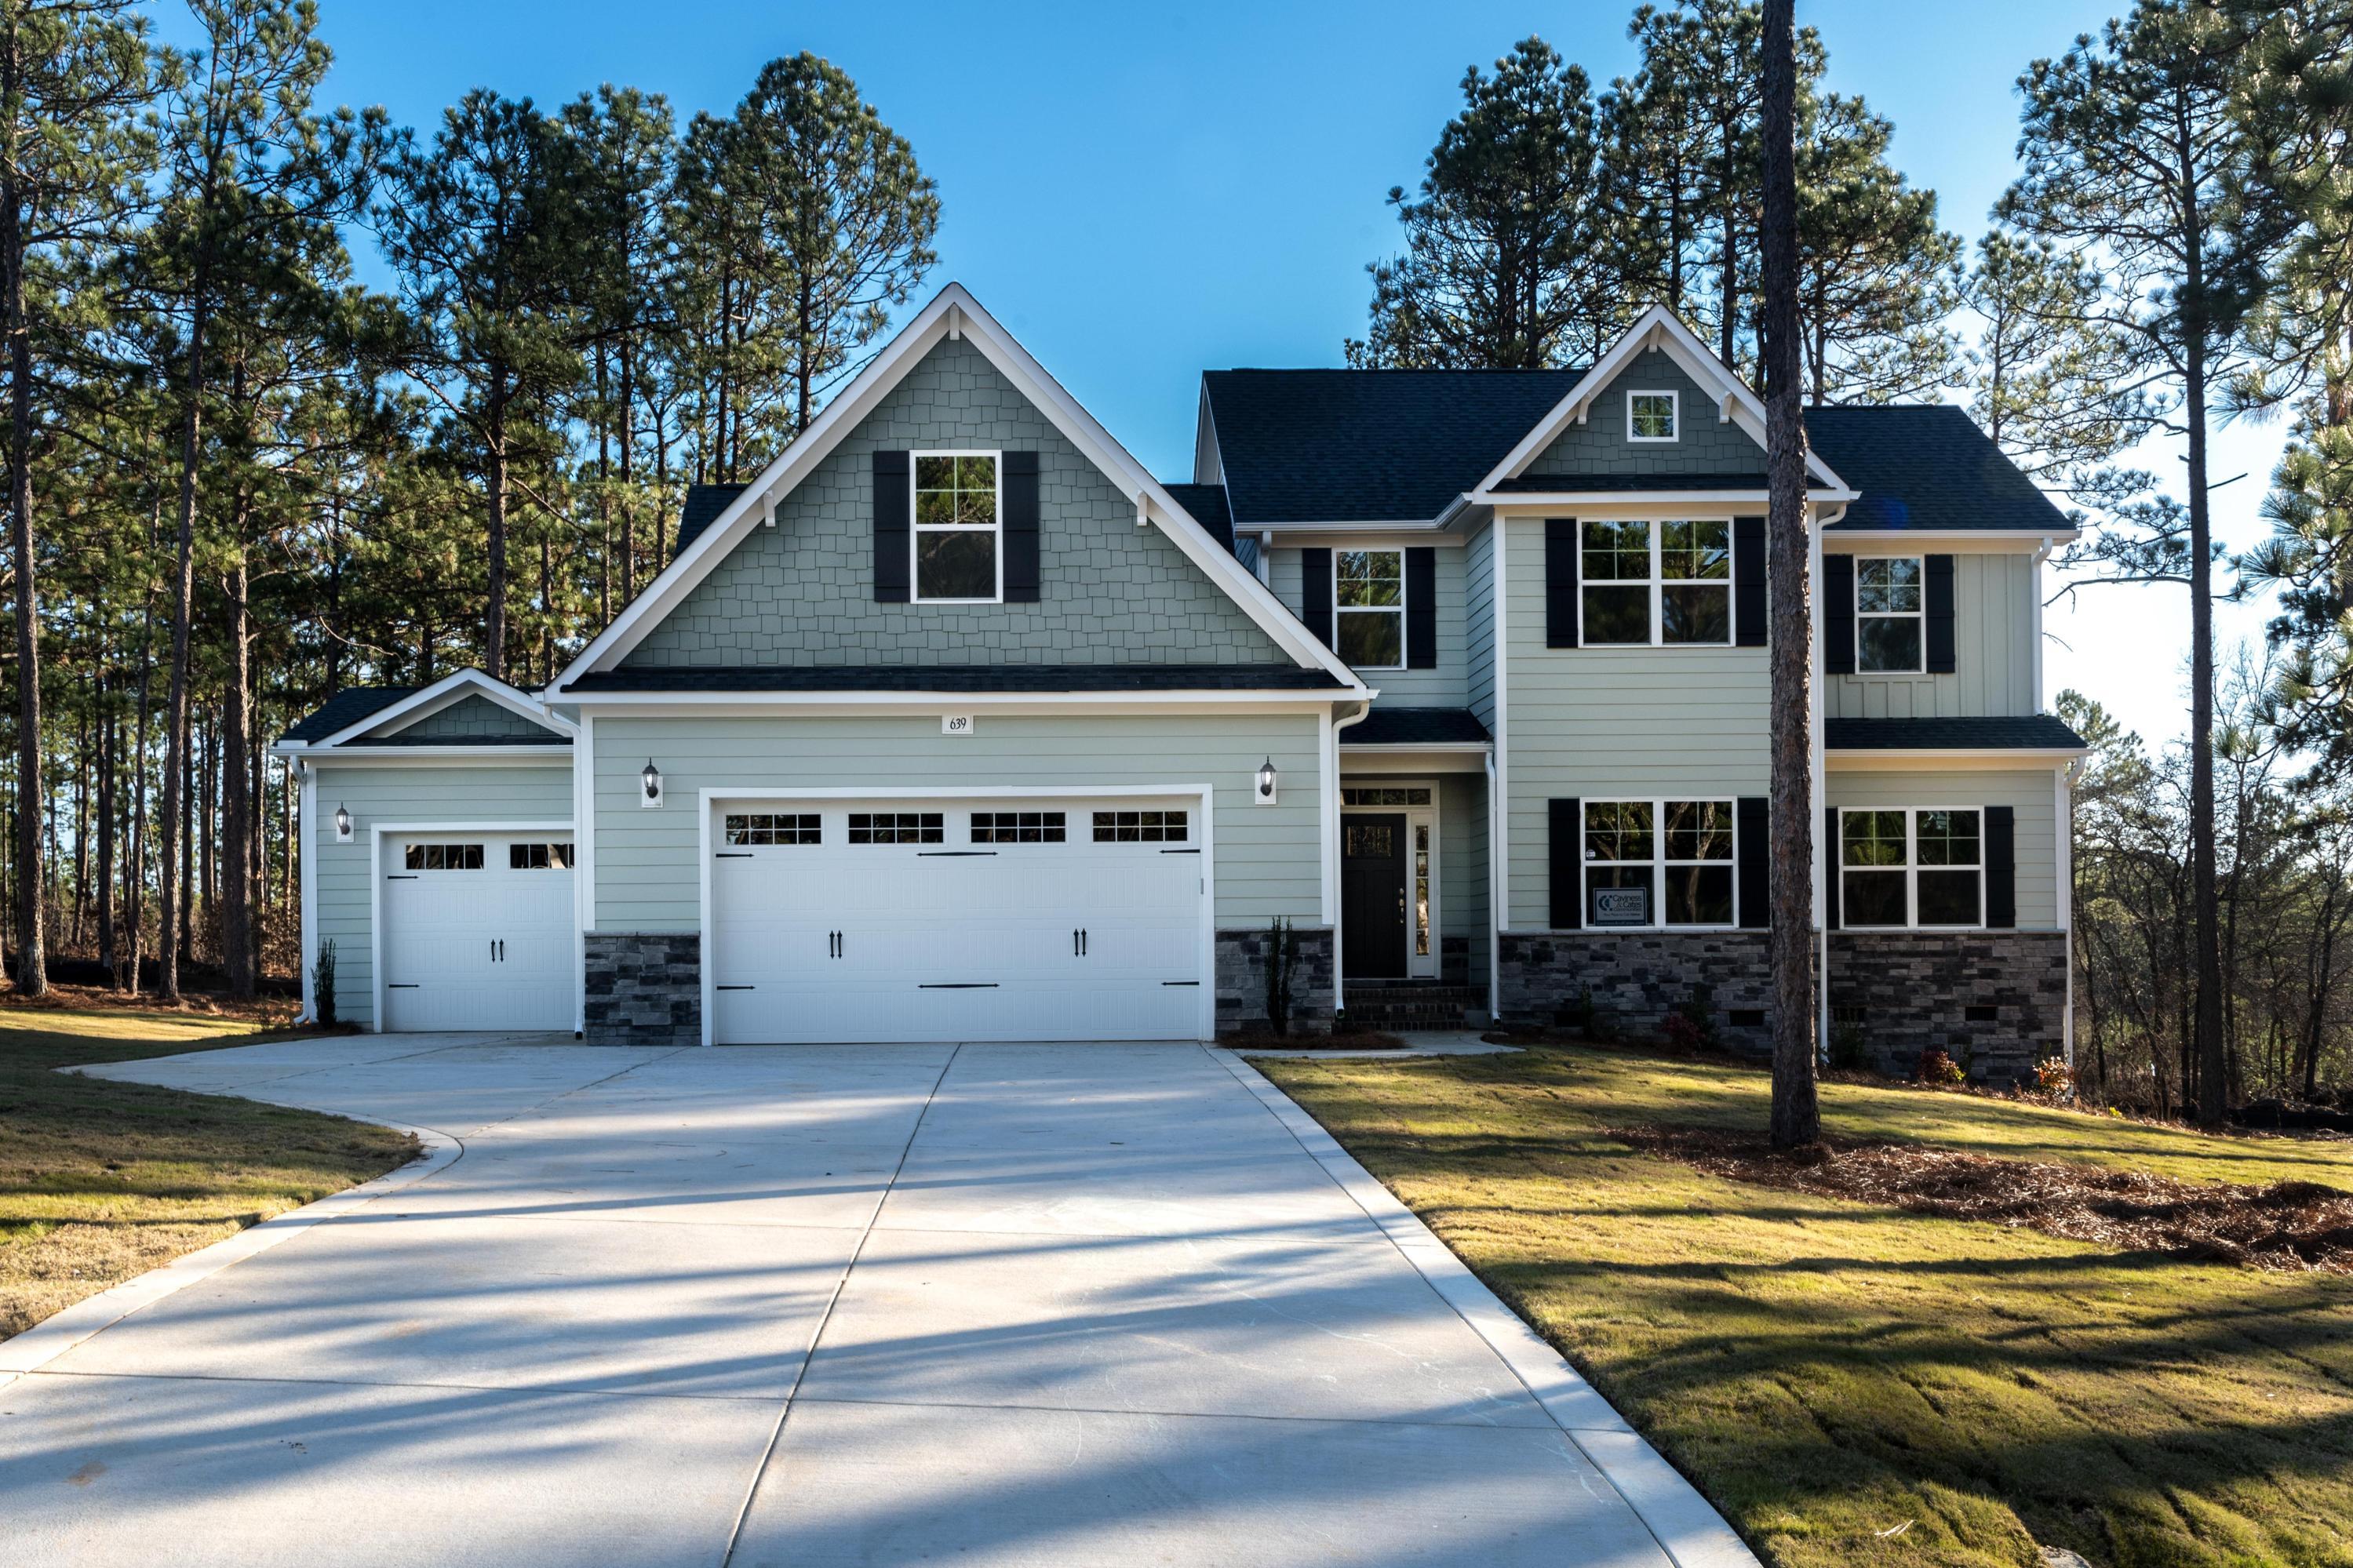 639  Planters Row, Whispering Pines, North Carolina